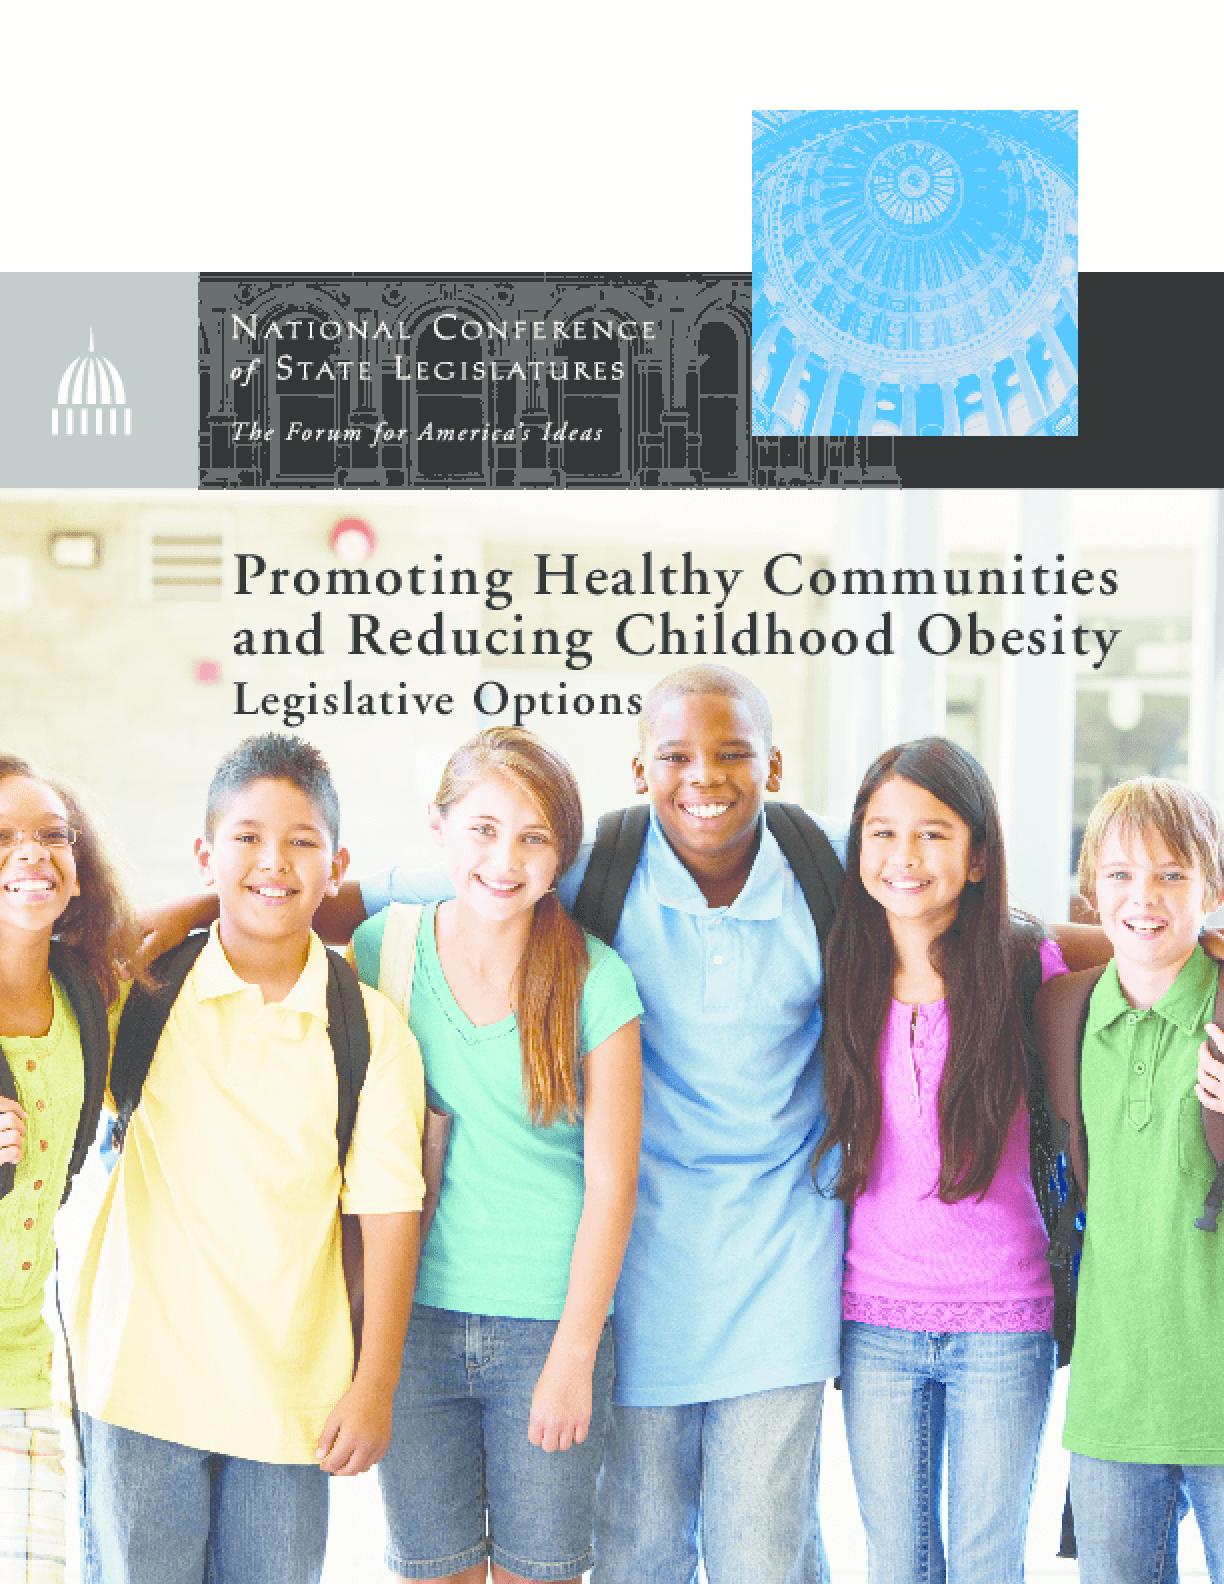 Promoting Healthy Communities and Reducing Childhood Obesity: Legislative Options